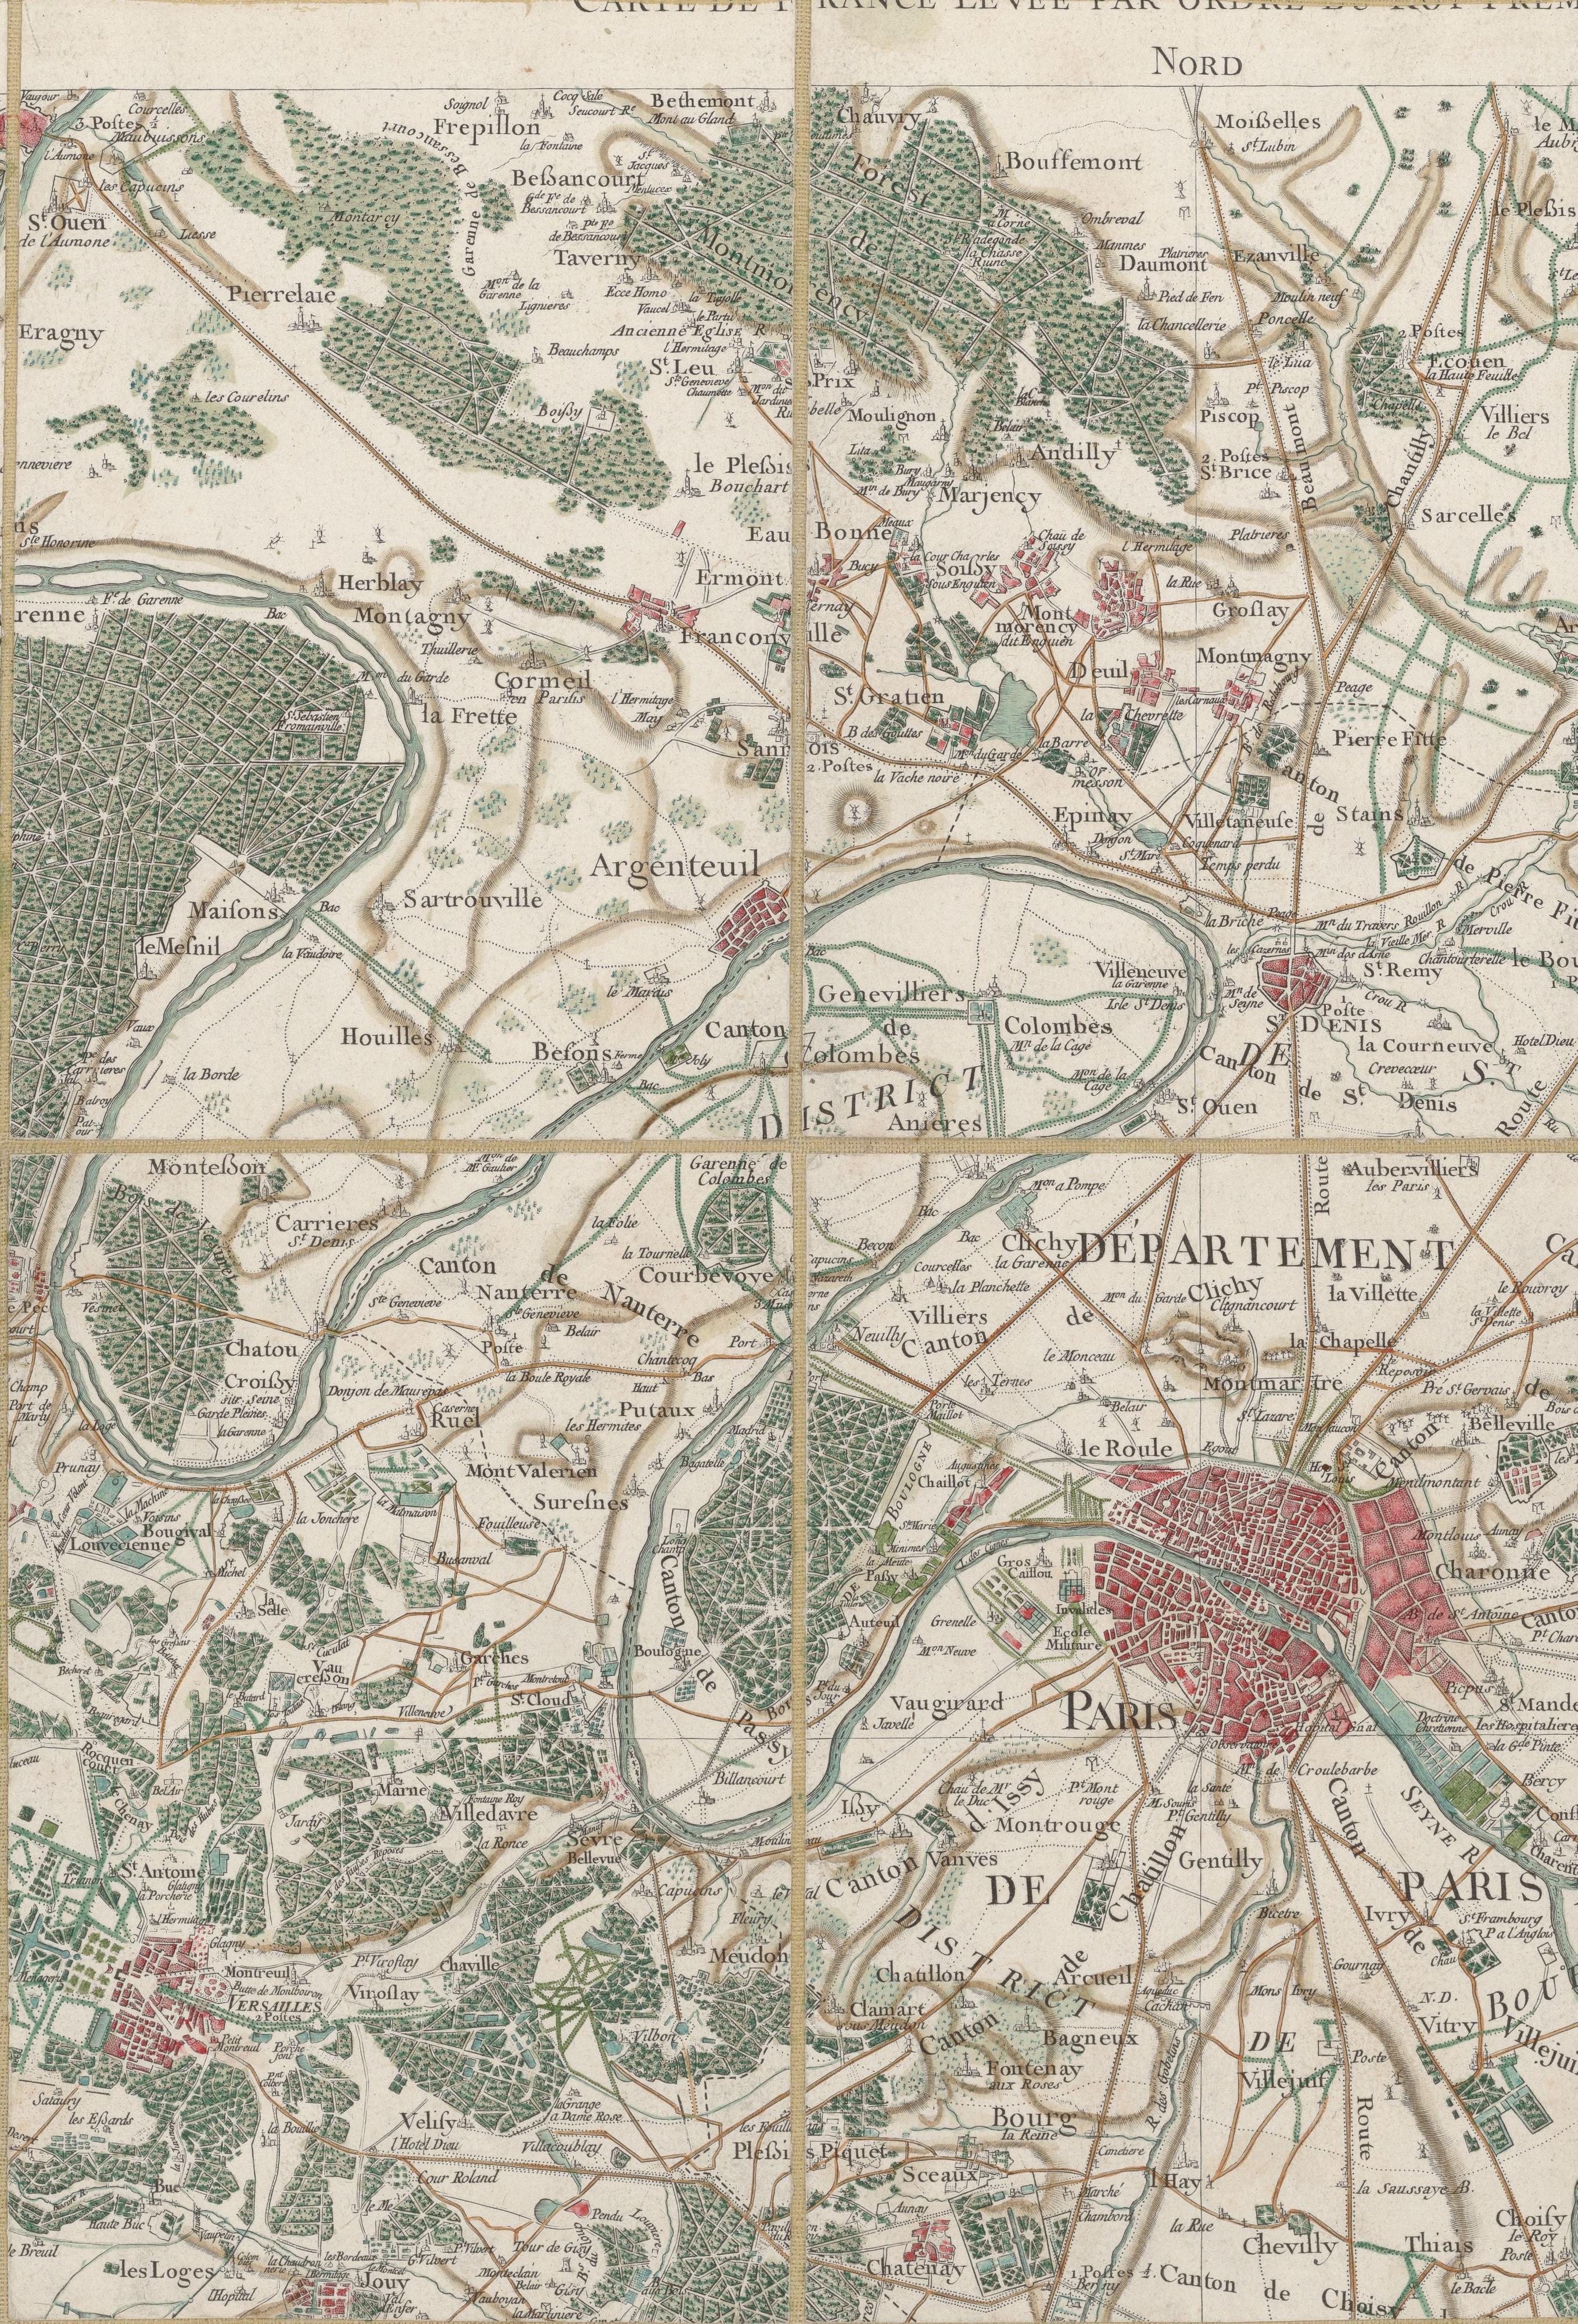 Plan de Colombes en 1756 - Carte de Cassini.